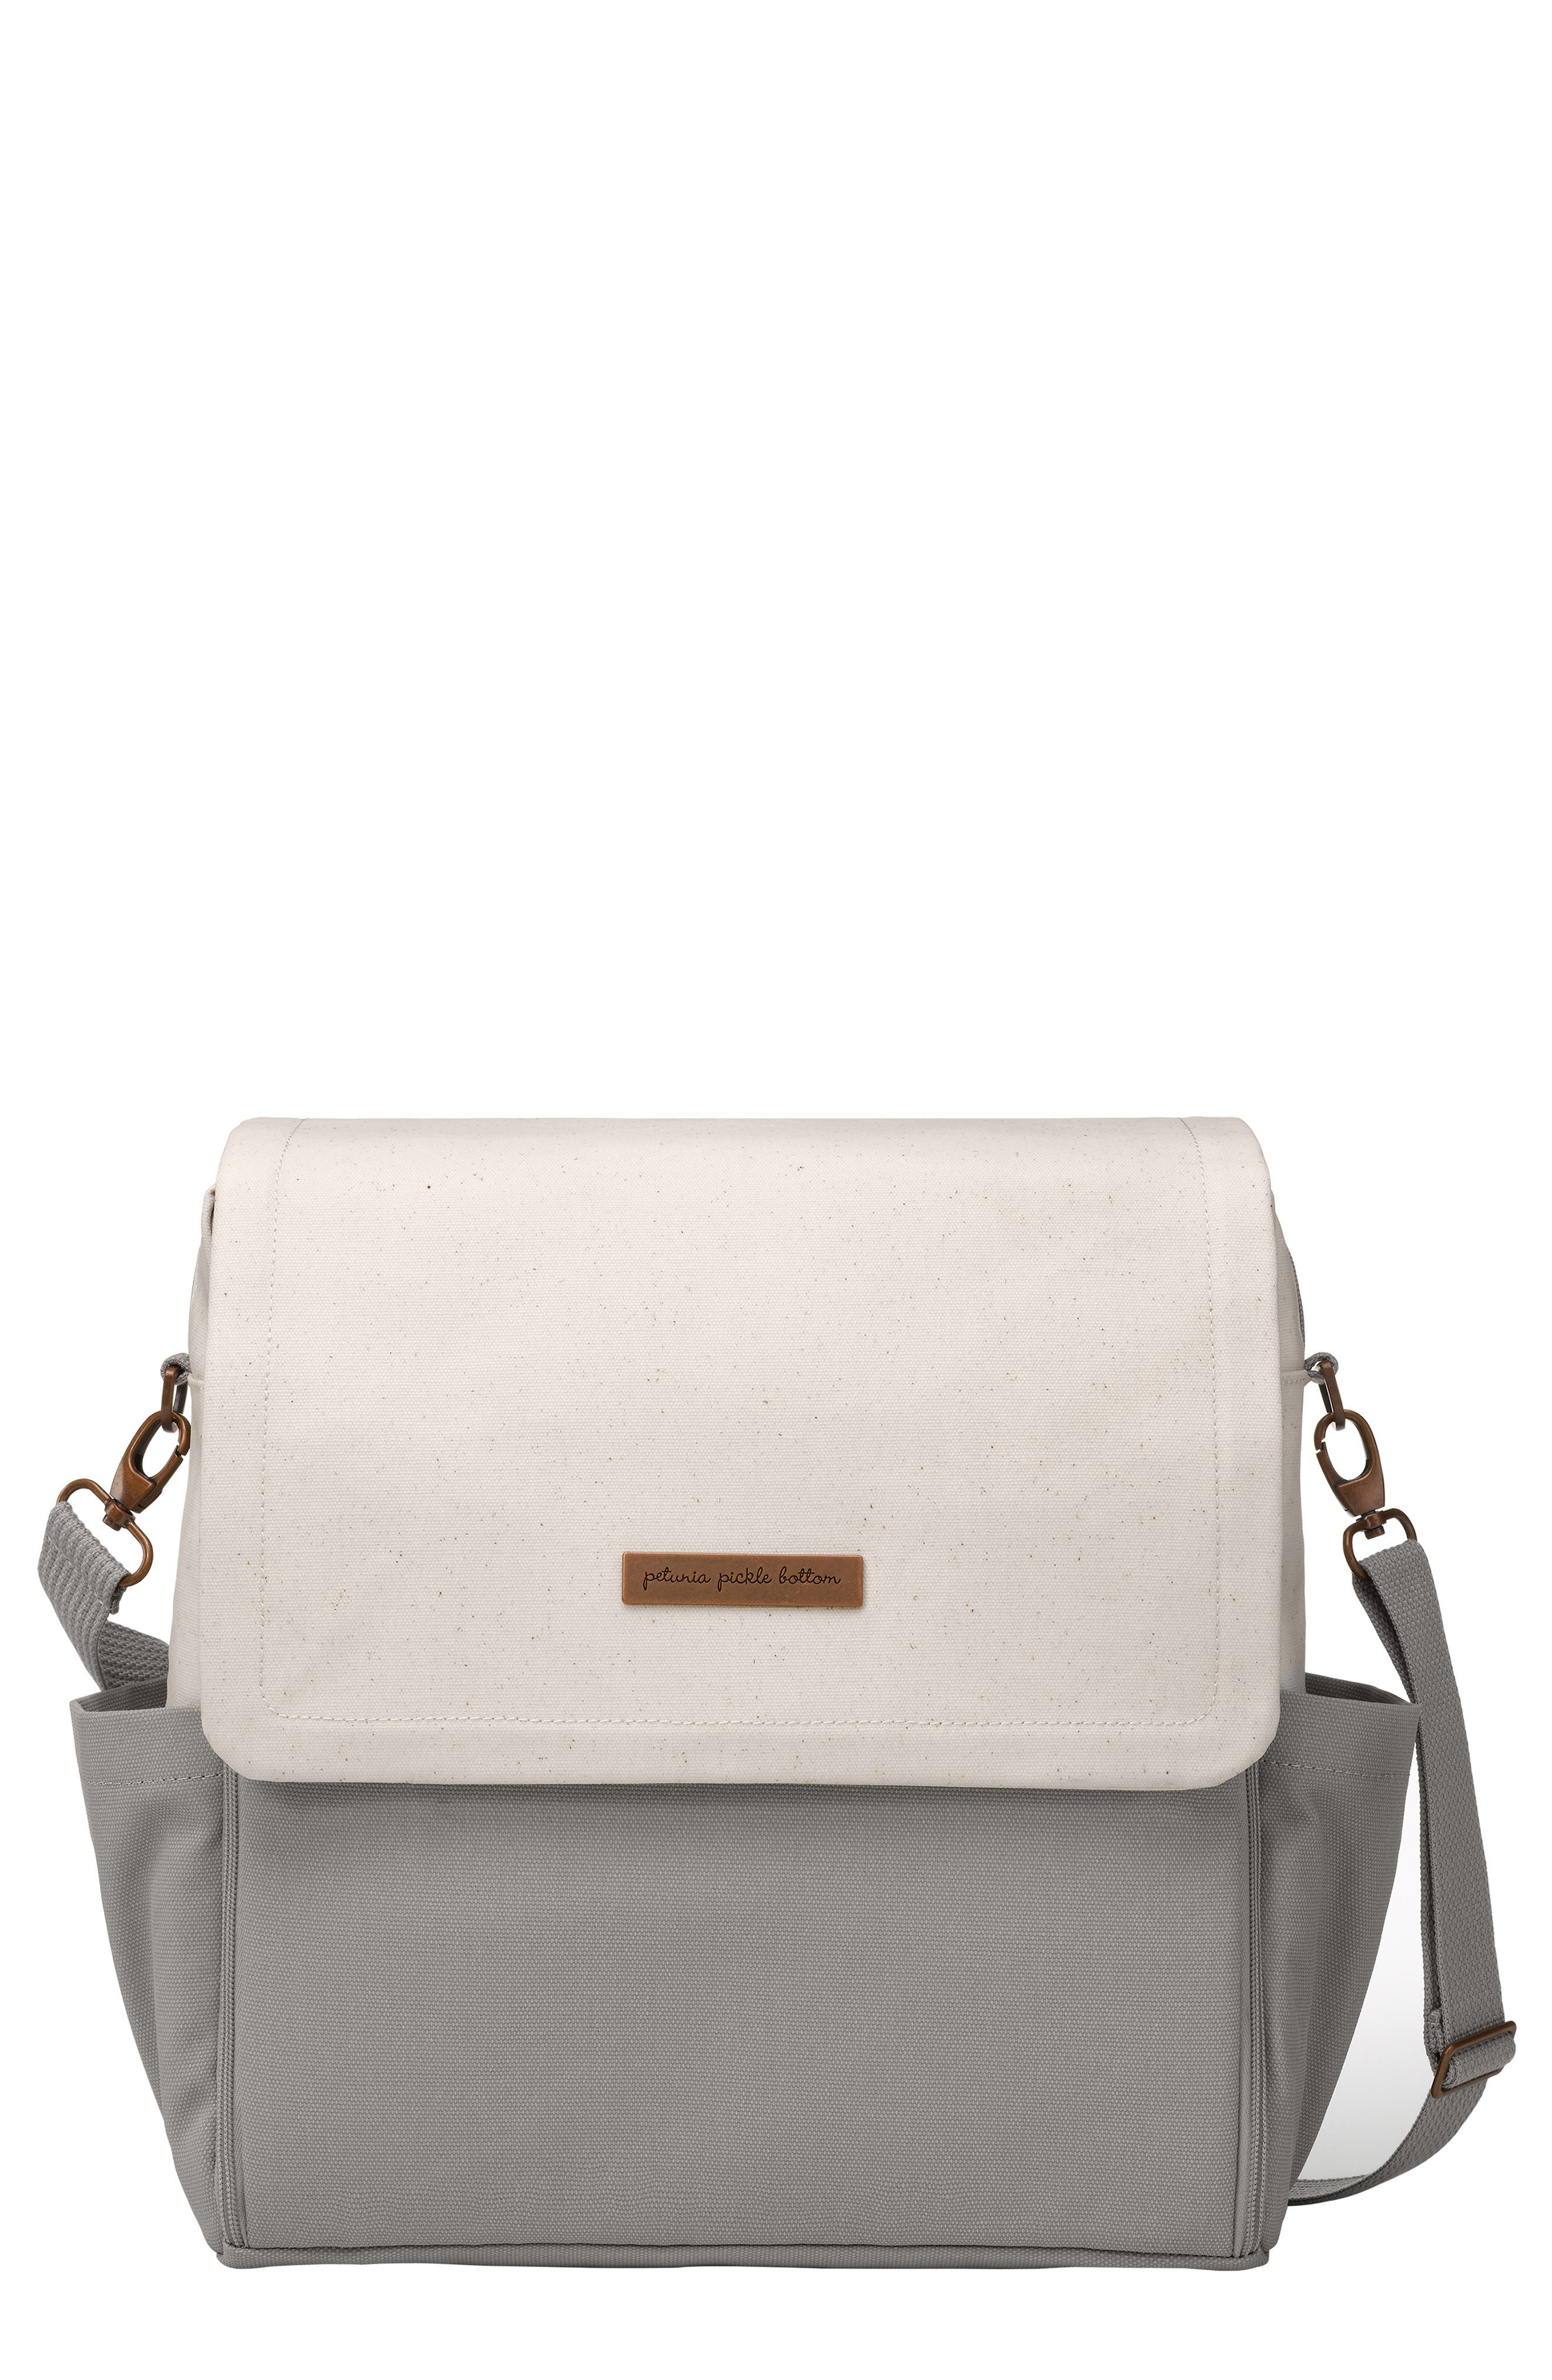 Boxy Backpack Diaper Bag,                             Main thumbnail 1, color,                             BIRCH/ STONE